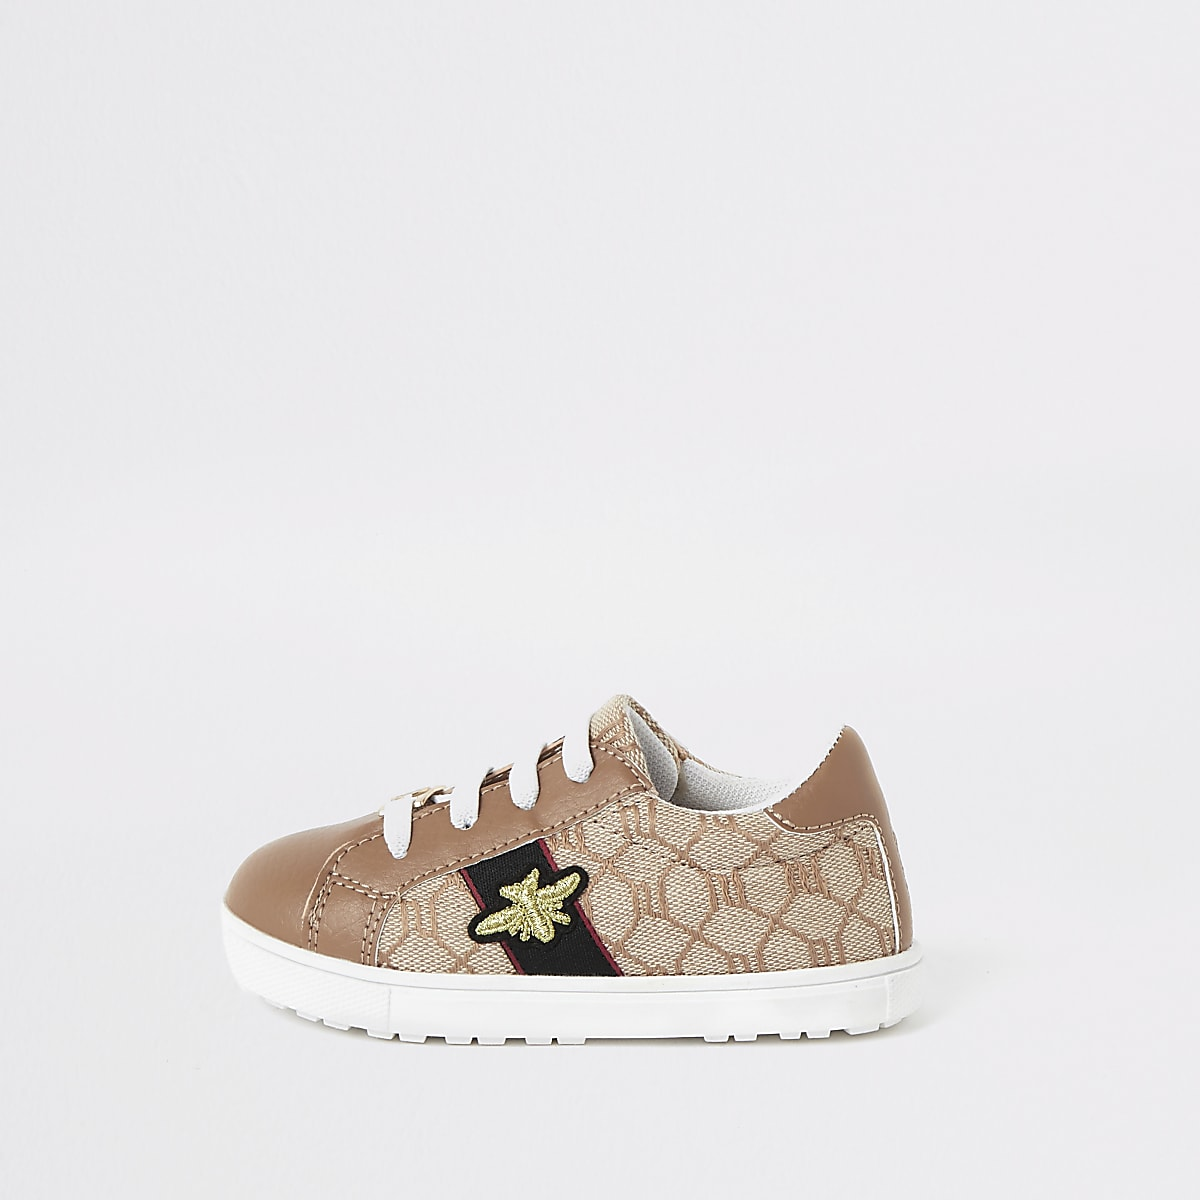 Mini - Bruine sneakers met RI-monogram voor meisjes